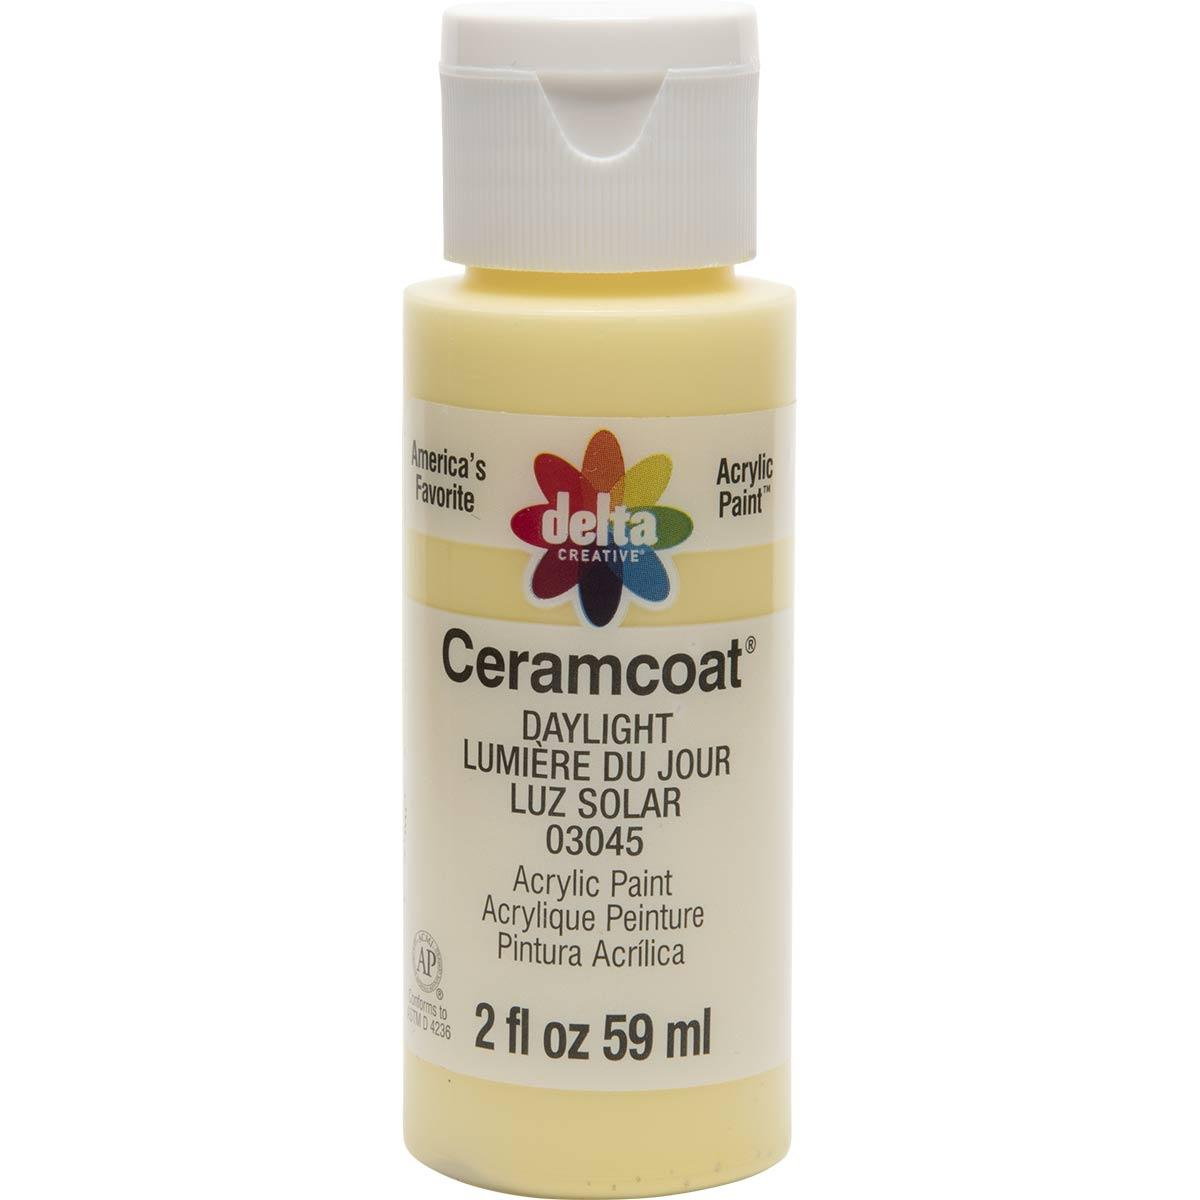 Delta Ceramcoat ® Acrylic Paint - Daylight, 2 oz.